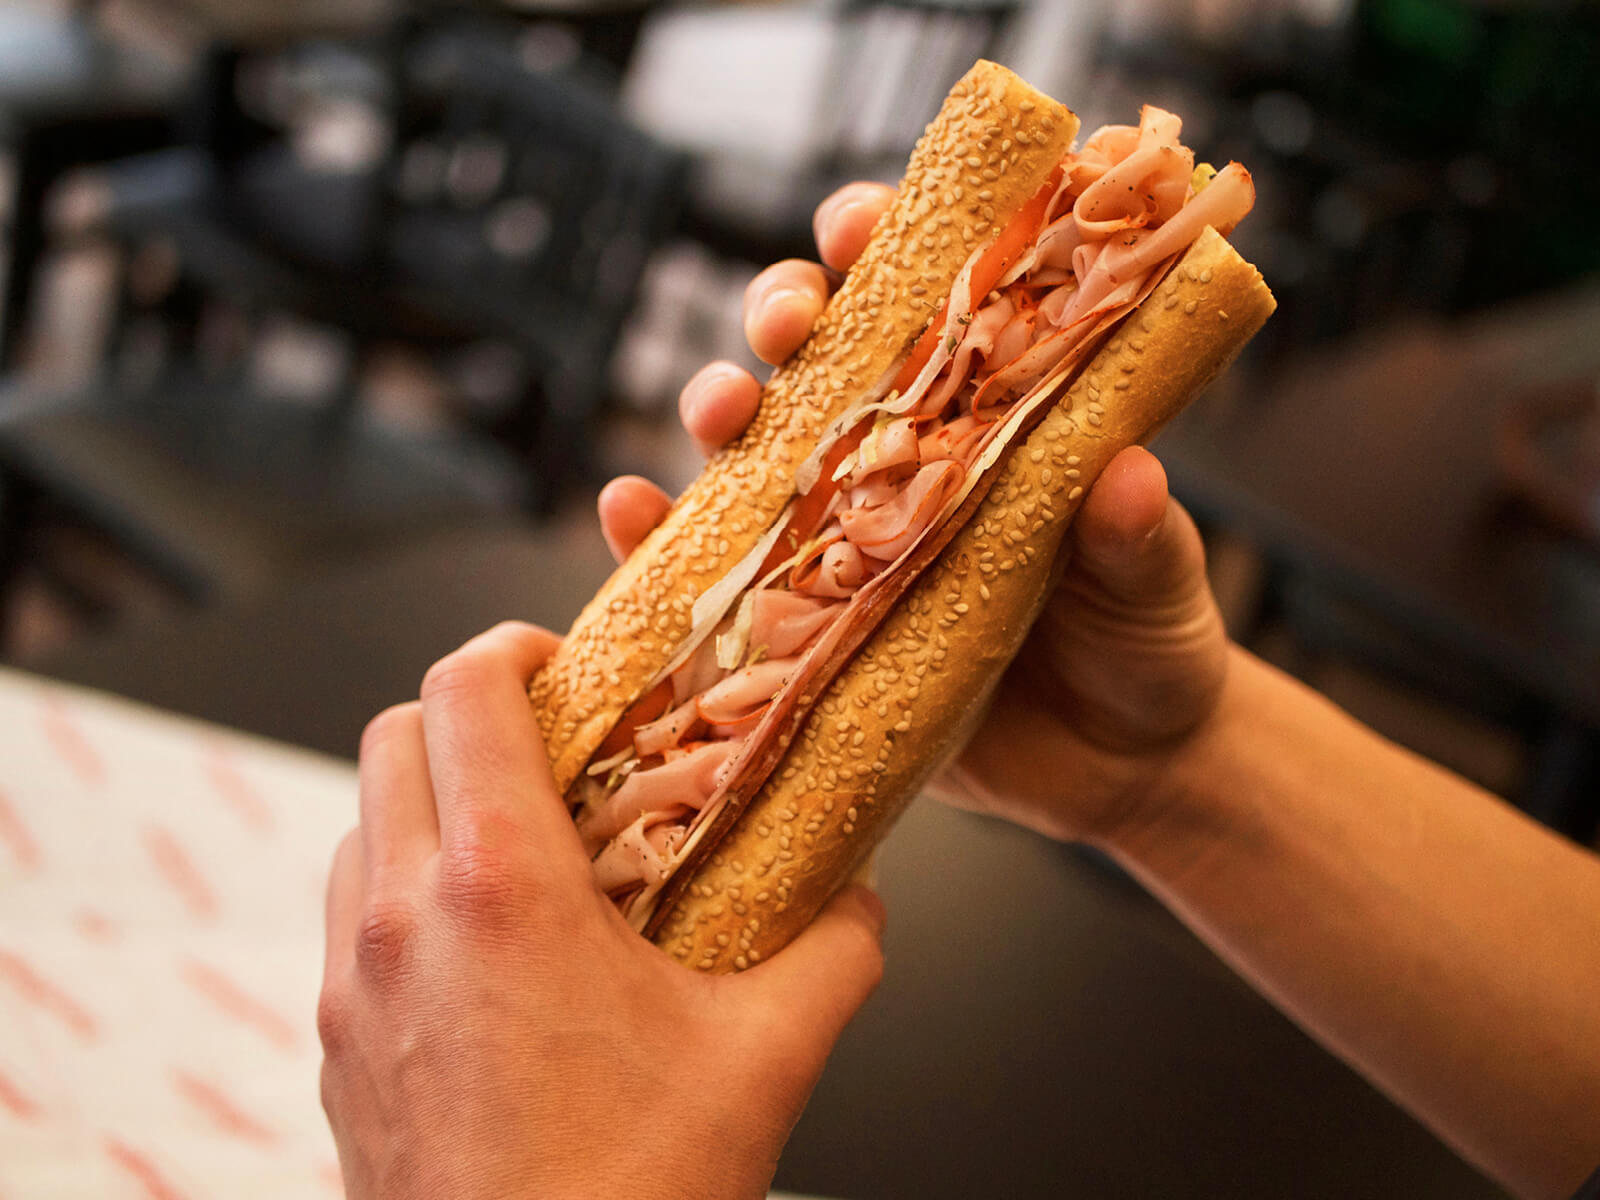 PrimoHoagies Franchise - Fresh Meats & Cheese & Award-Wining Bread